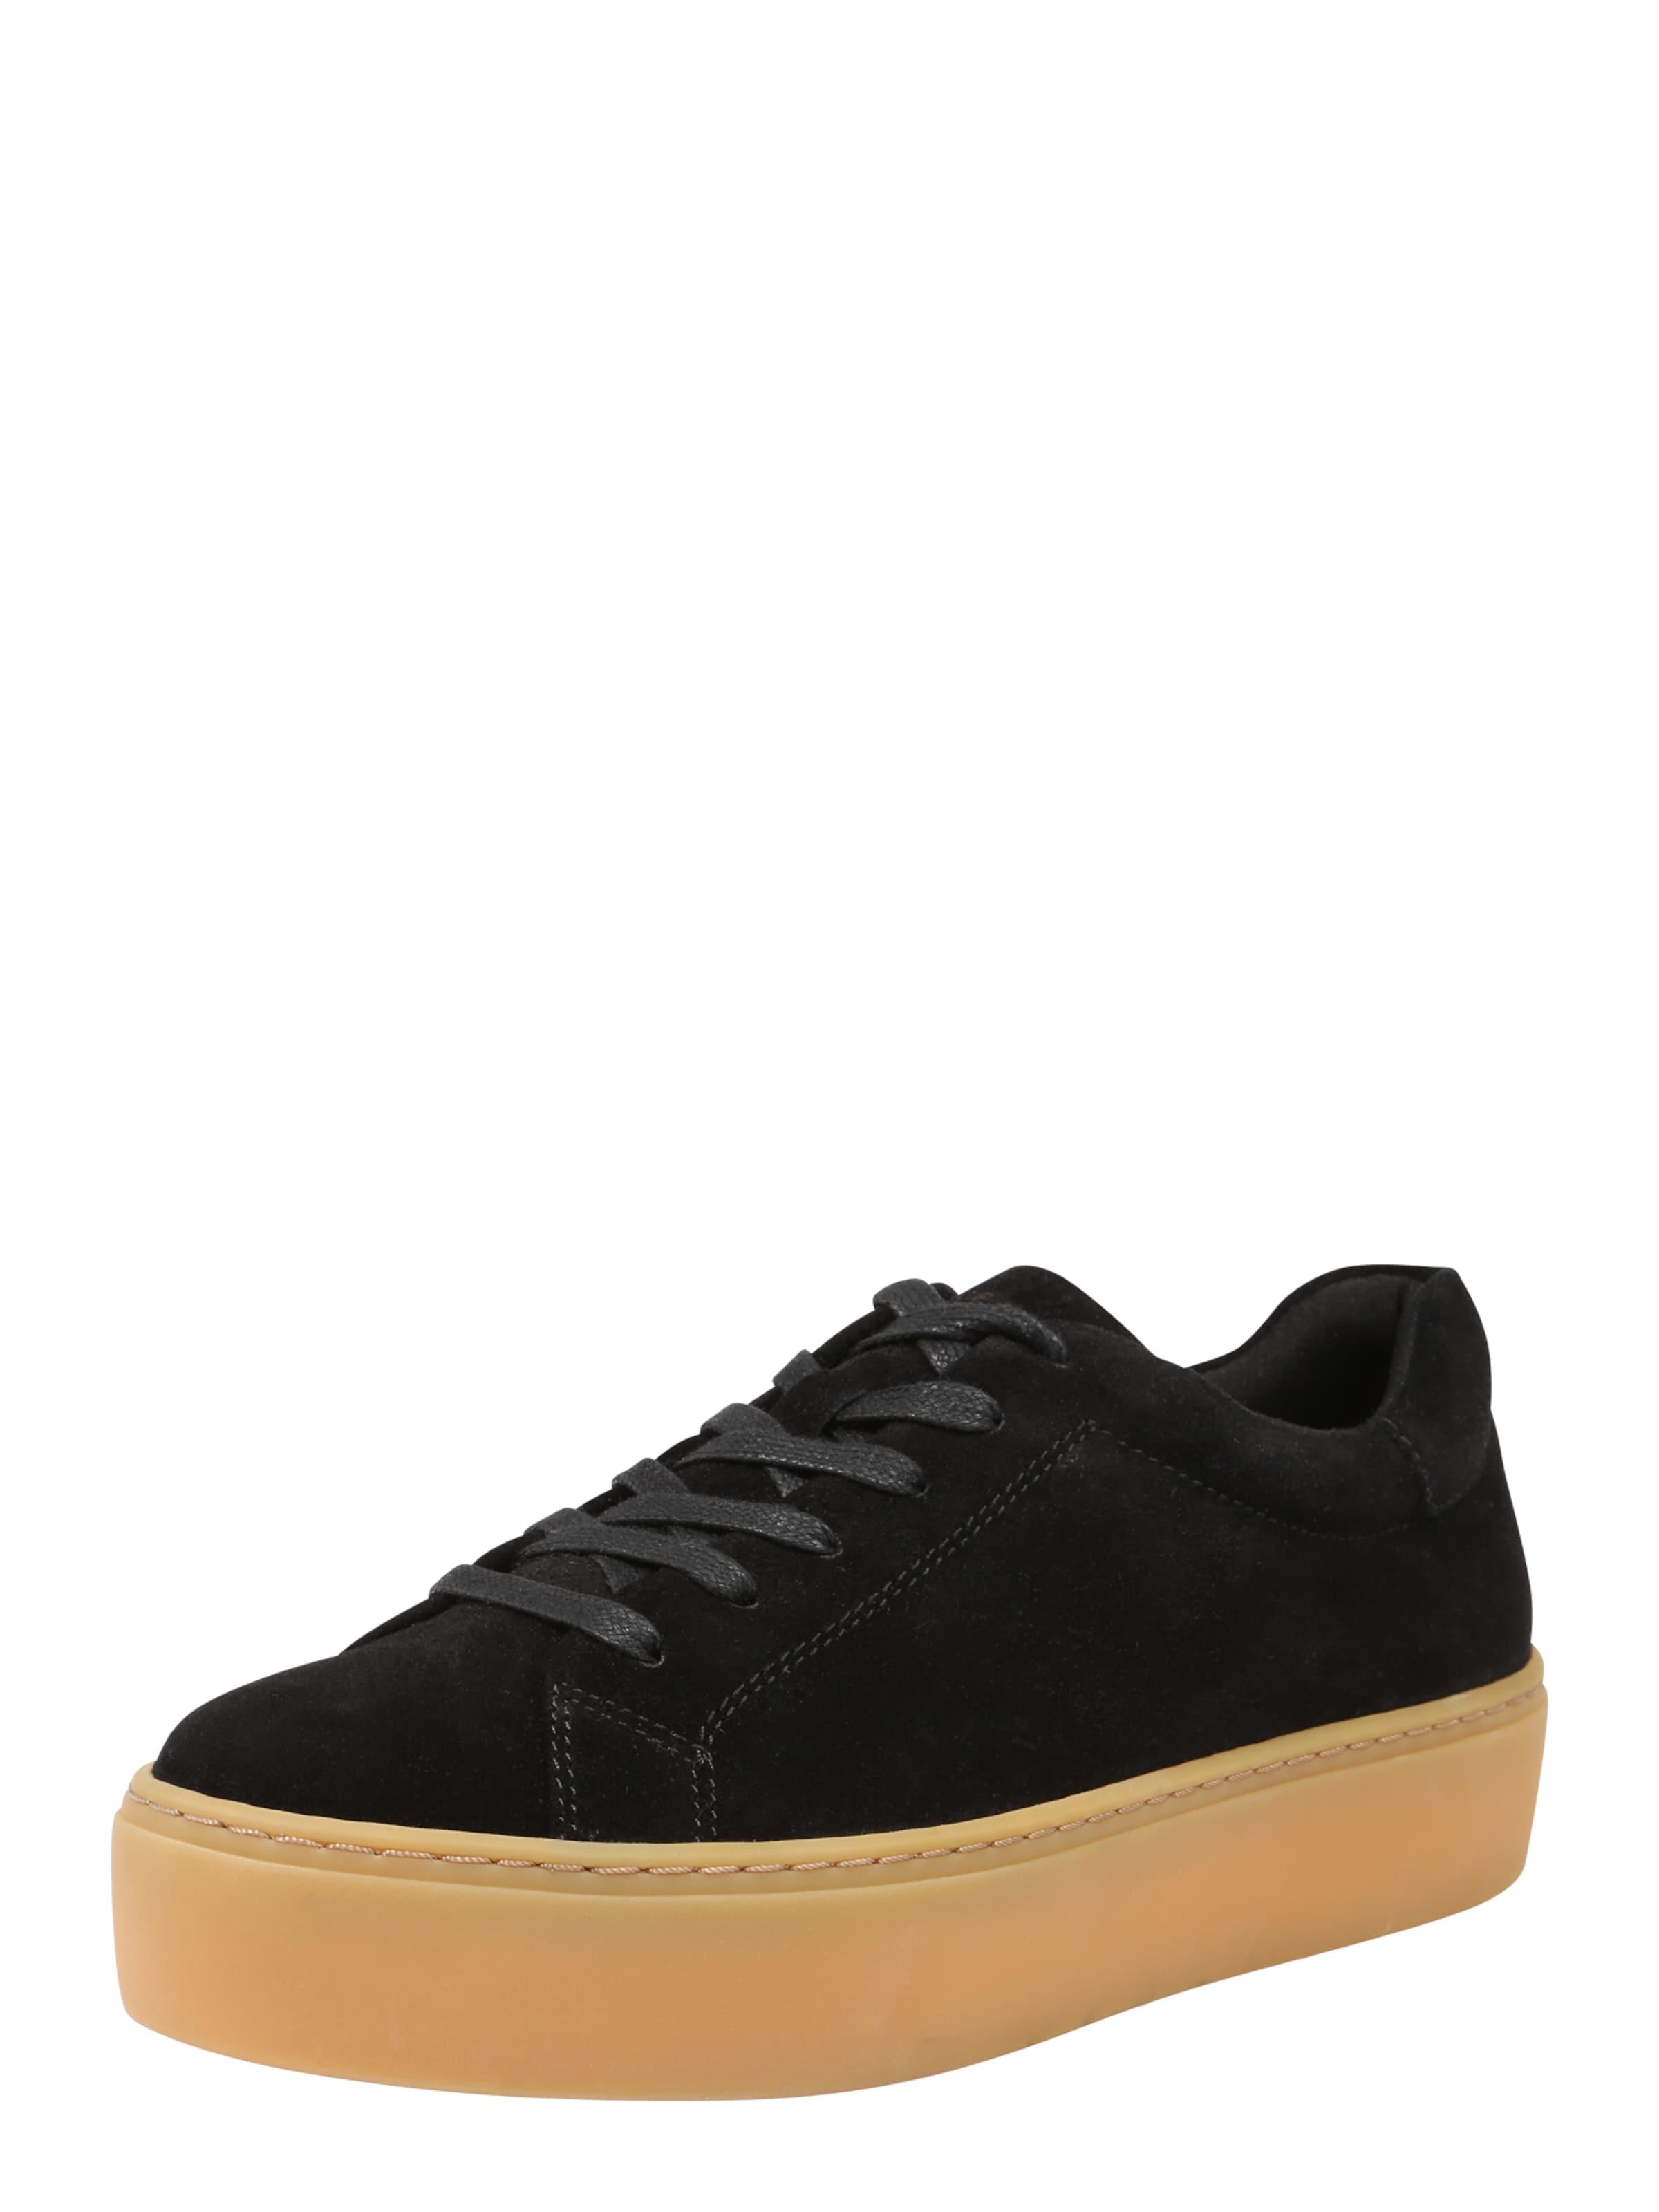 VAGABOND SHOEMAKERS Sneaker 'Jessie' Outlet Billige Qualität MJrpRZN3x